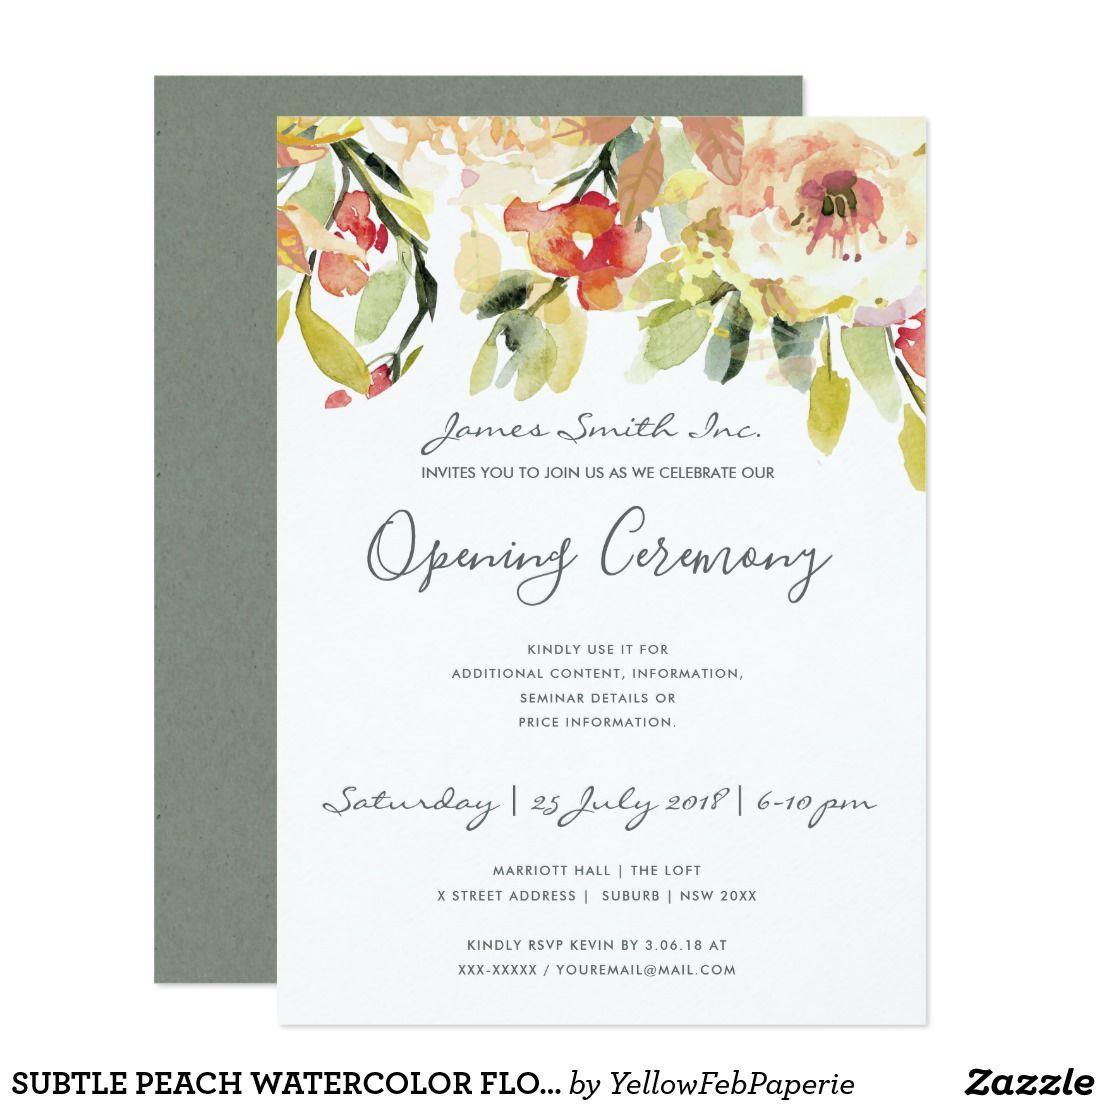 Peach Watercolor Floral Grand Opening Ceremony Invitation Zazzle Com In 2020 Grand Opening Invitations Invitations Floral Watercolor